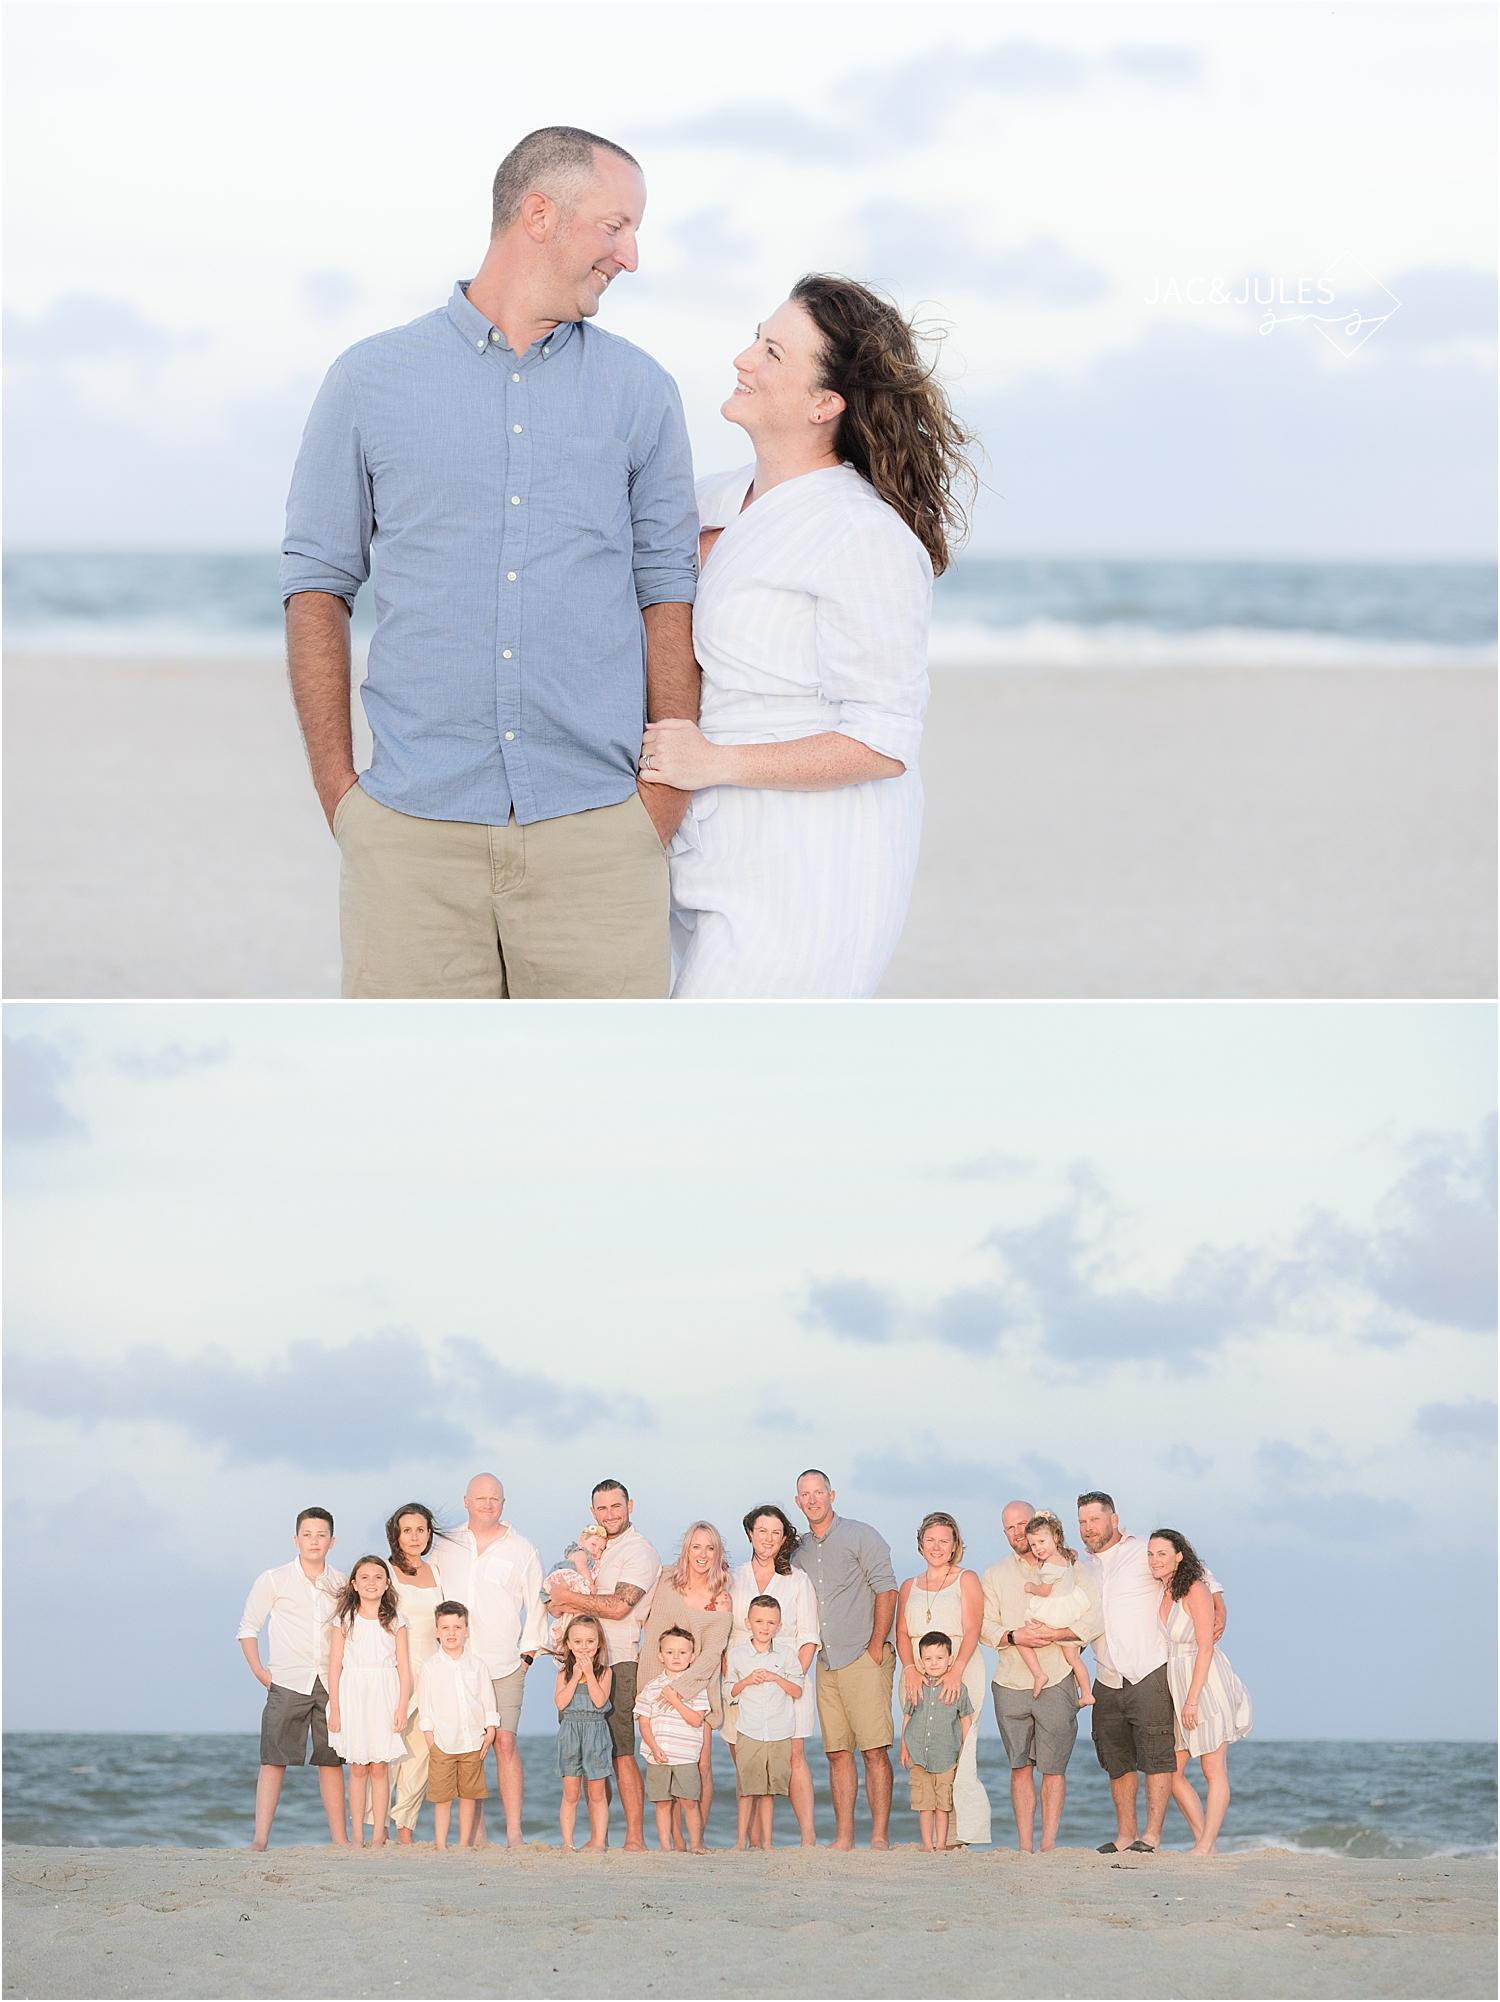 nj-family-beach-photo_1253.jpg